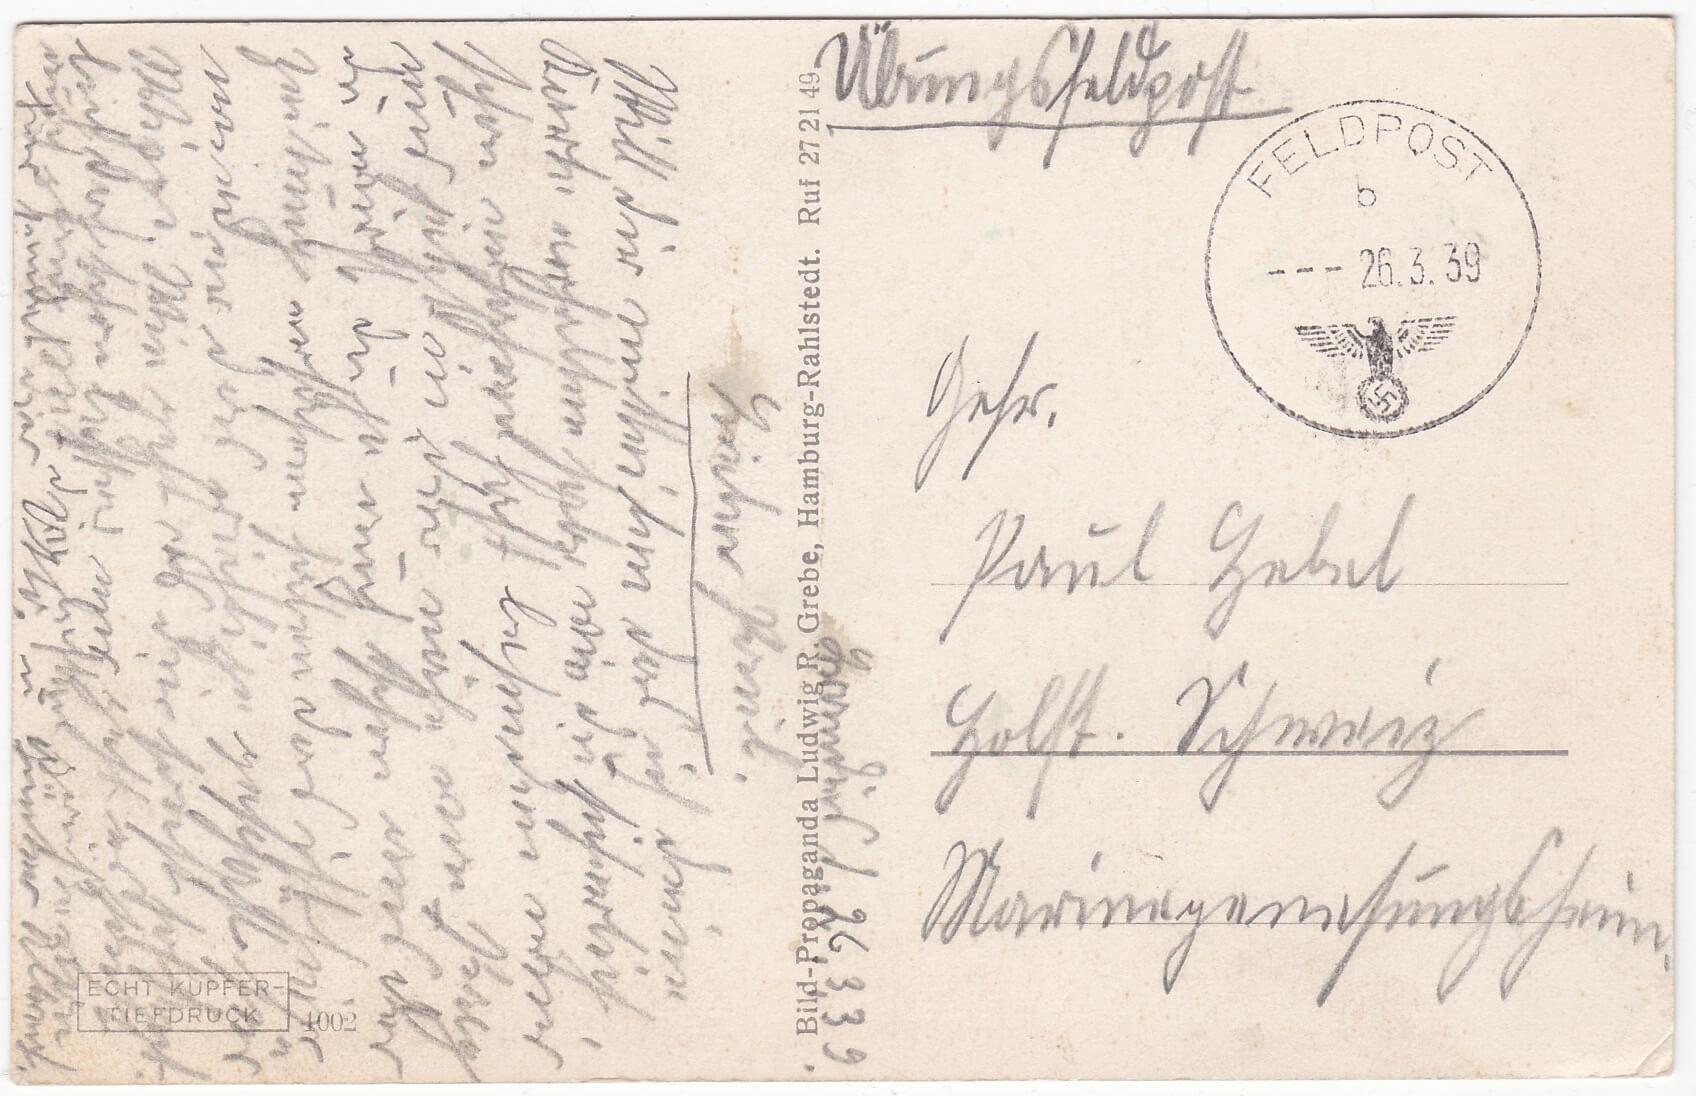 Feldpost osten 1939 26 3 kaart